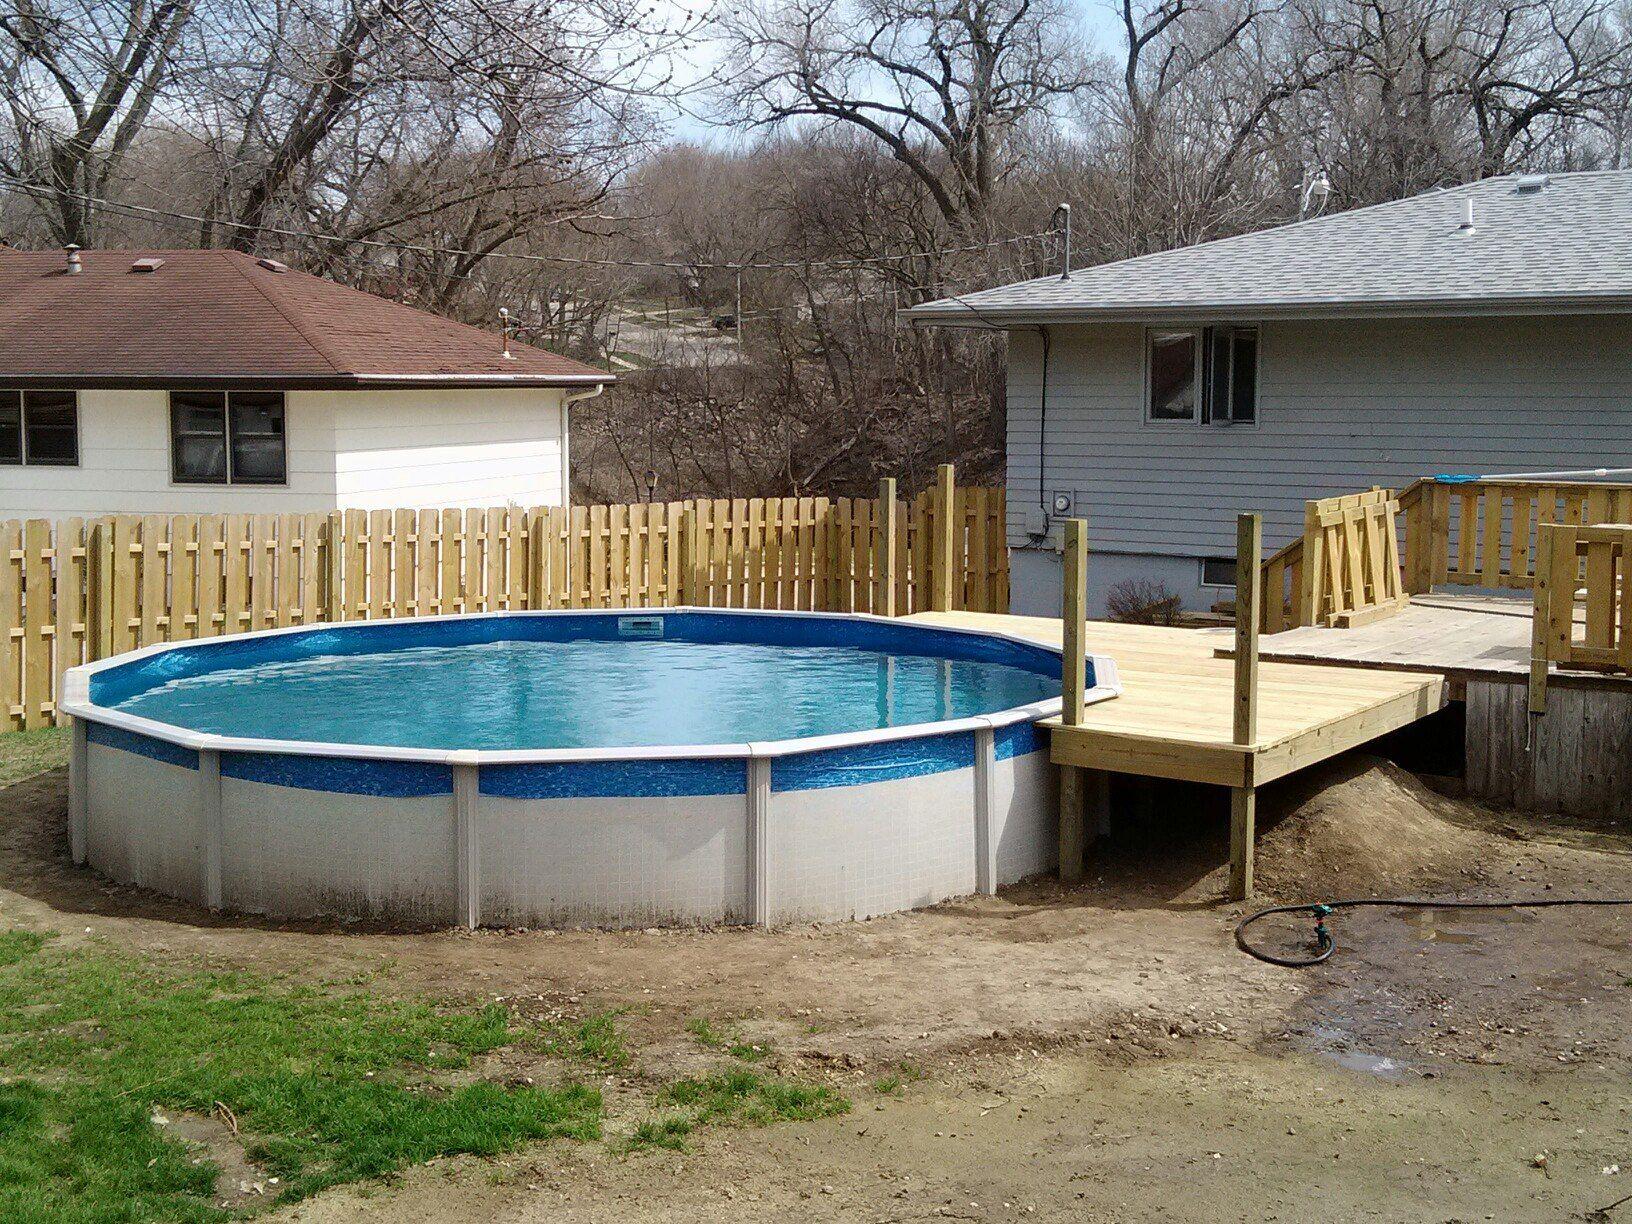 21 Pool Deck Off Of Existing Deck Pool Patio Pool Backyard Retreat